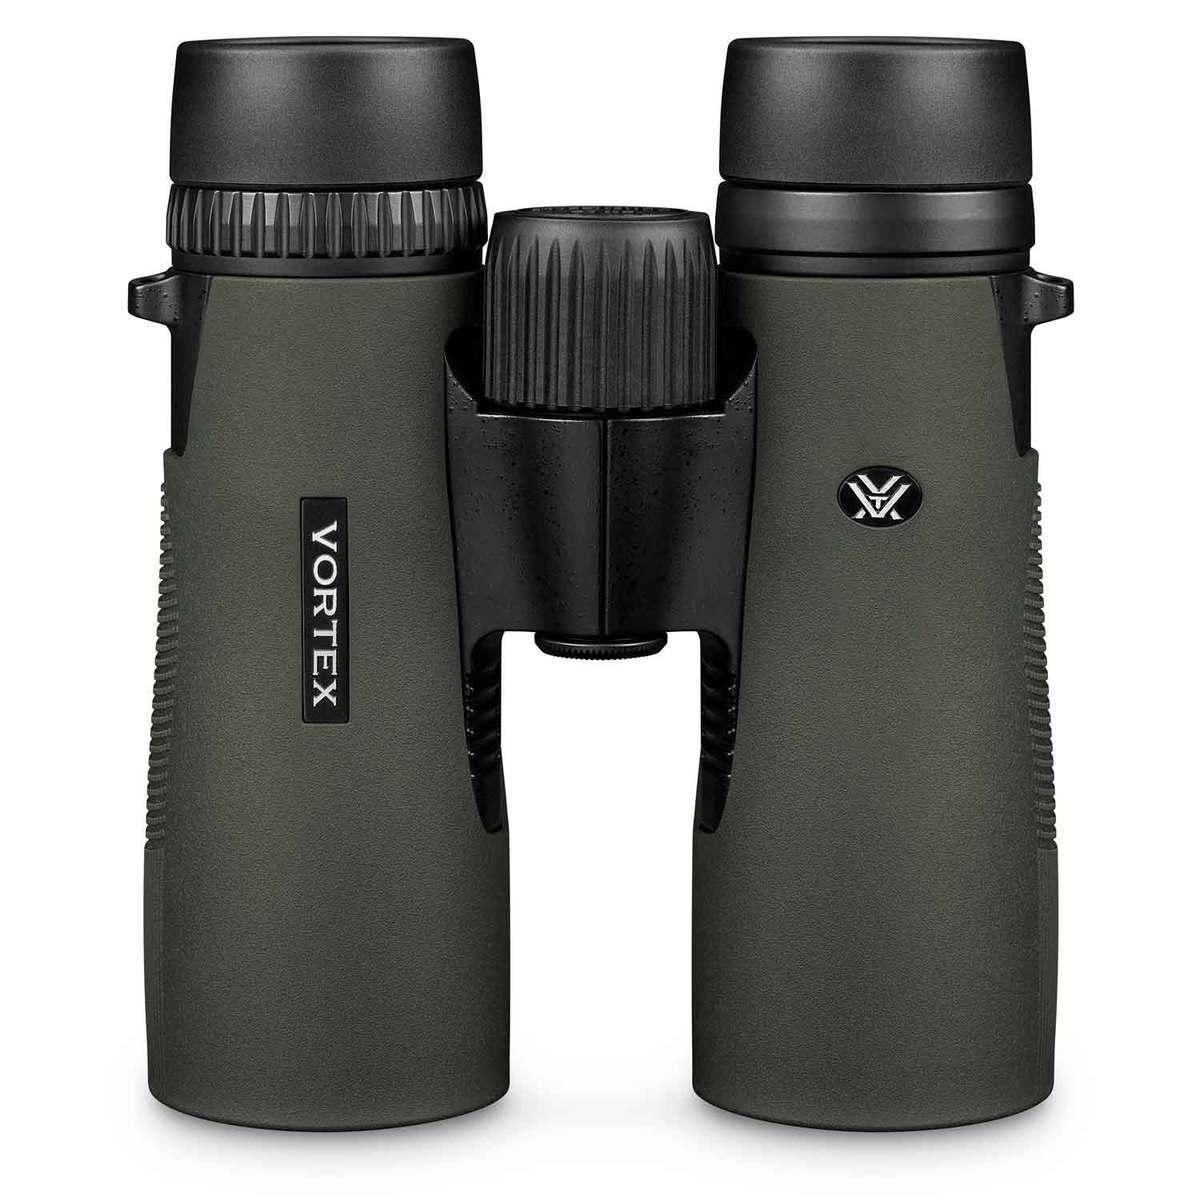 Vortex Diamondback HD Full Size Binoculars - 10x42